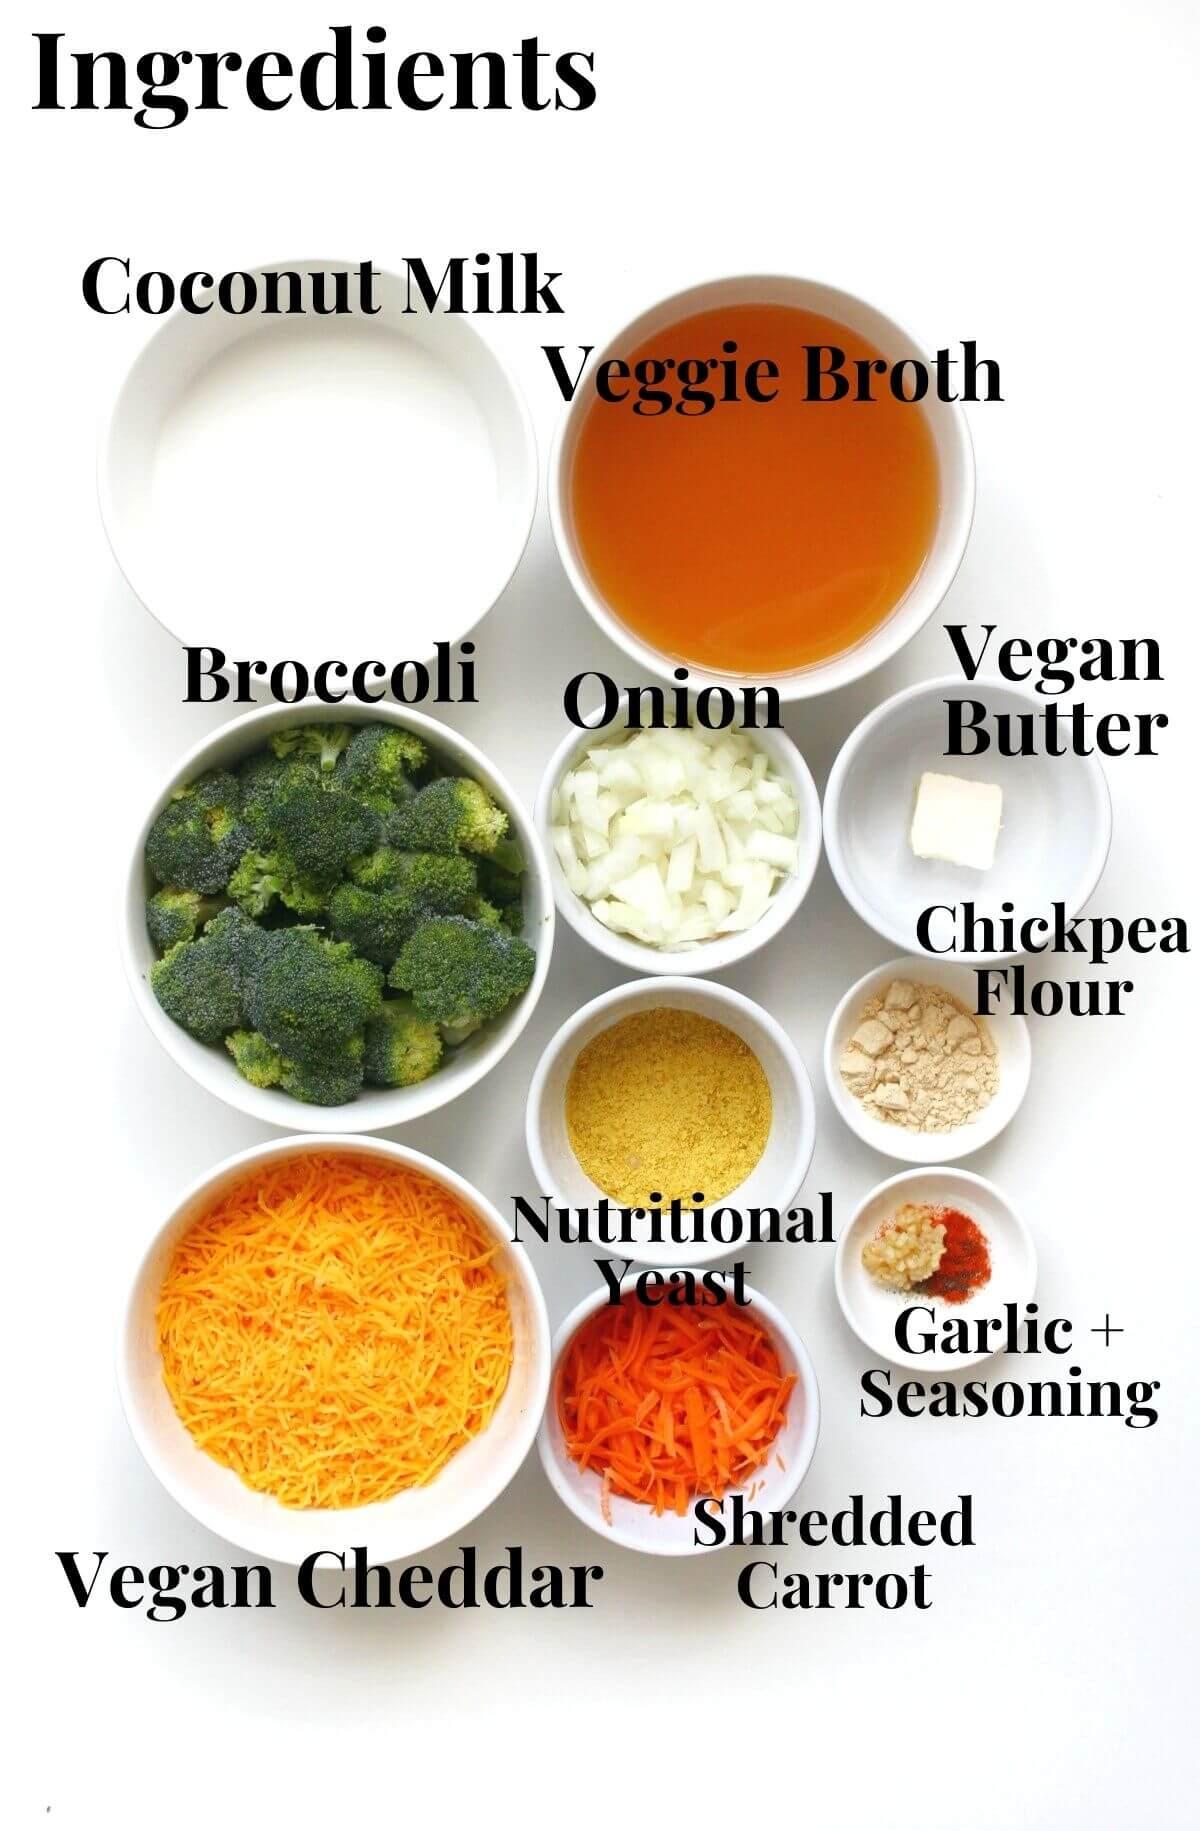 ingredients for homemade vegan broccoli cheddar soup